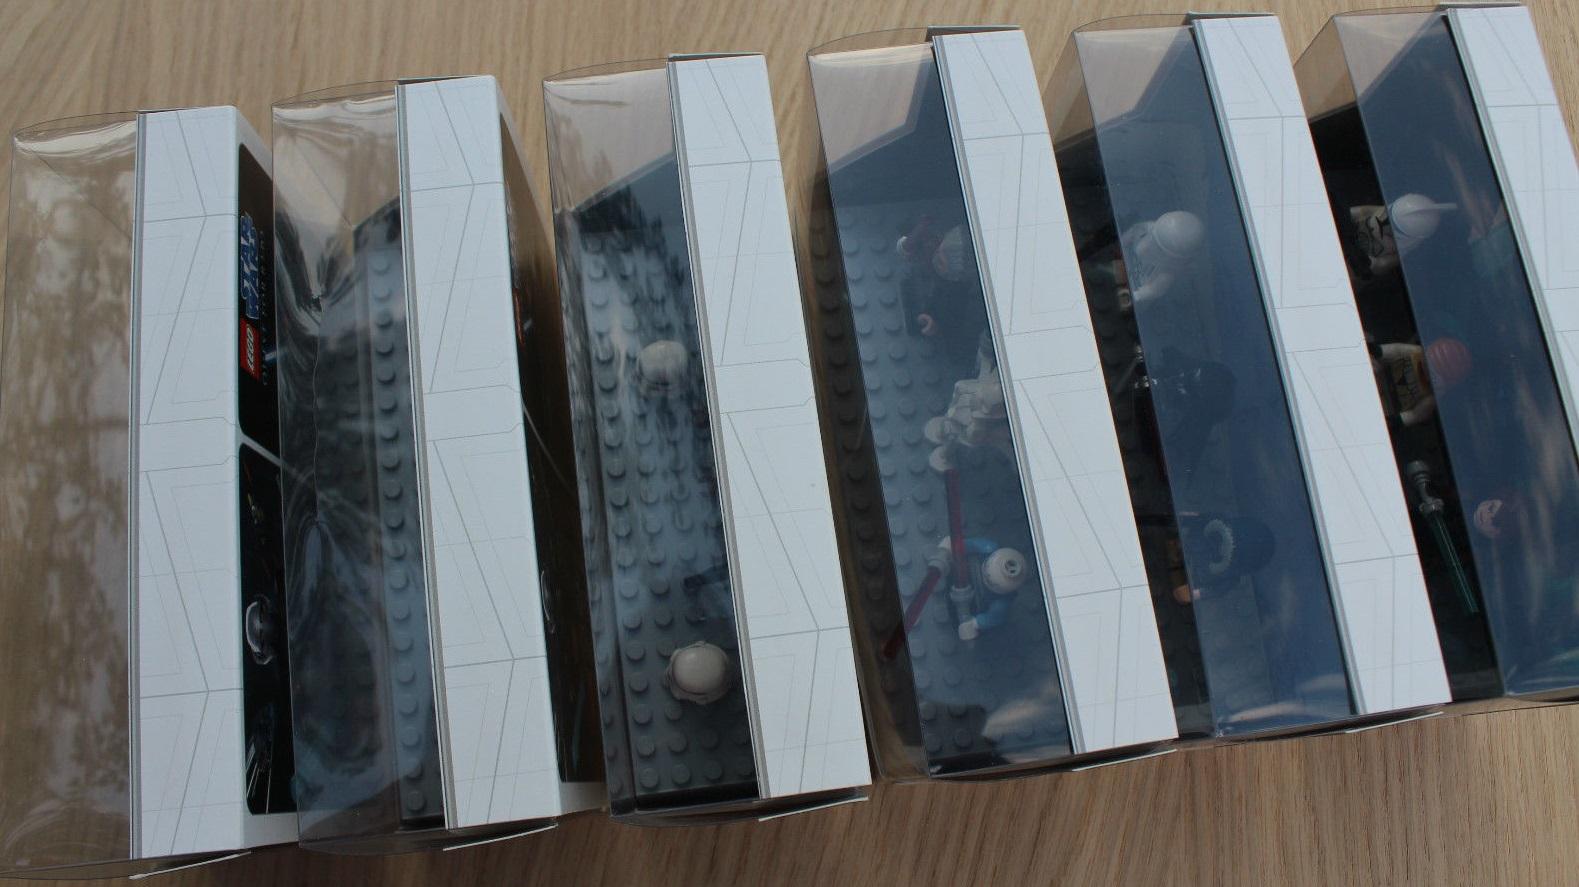 Lego SDCC 2009 Dislay Sets Back